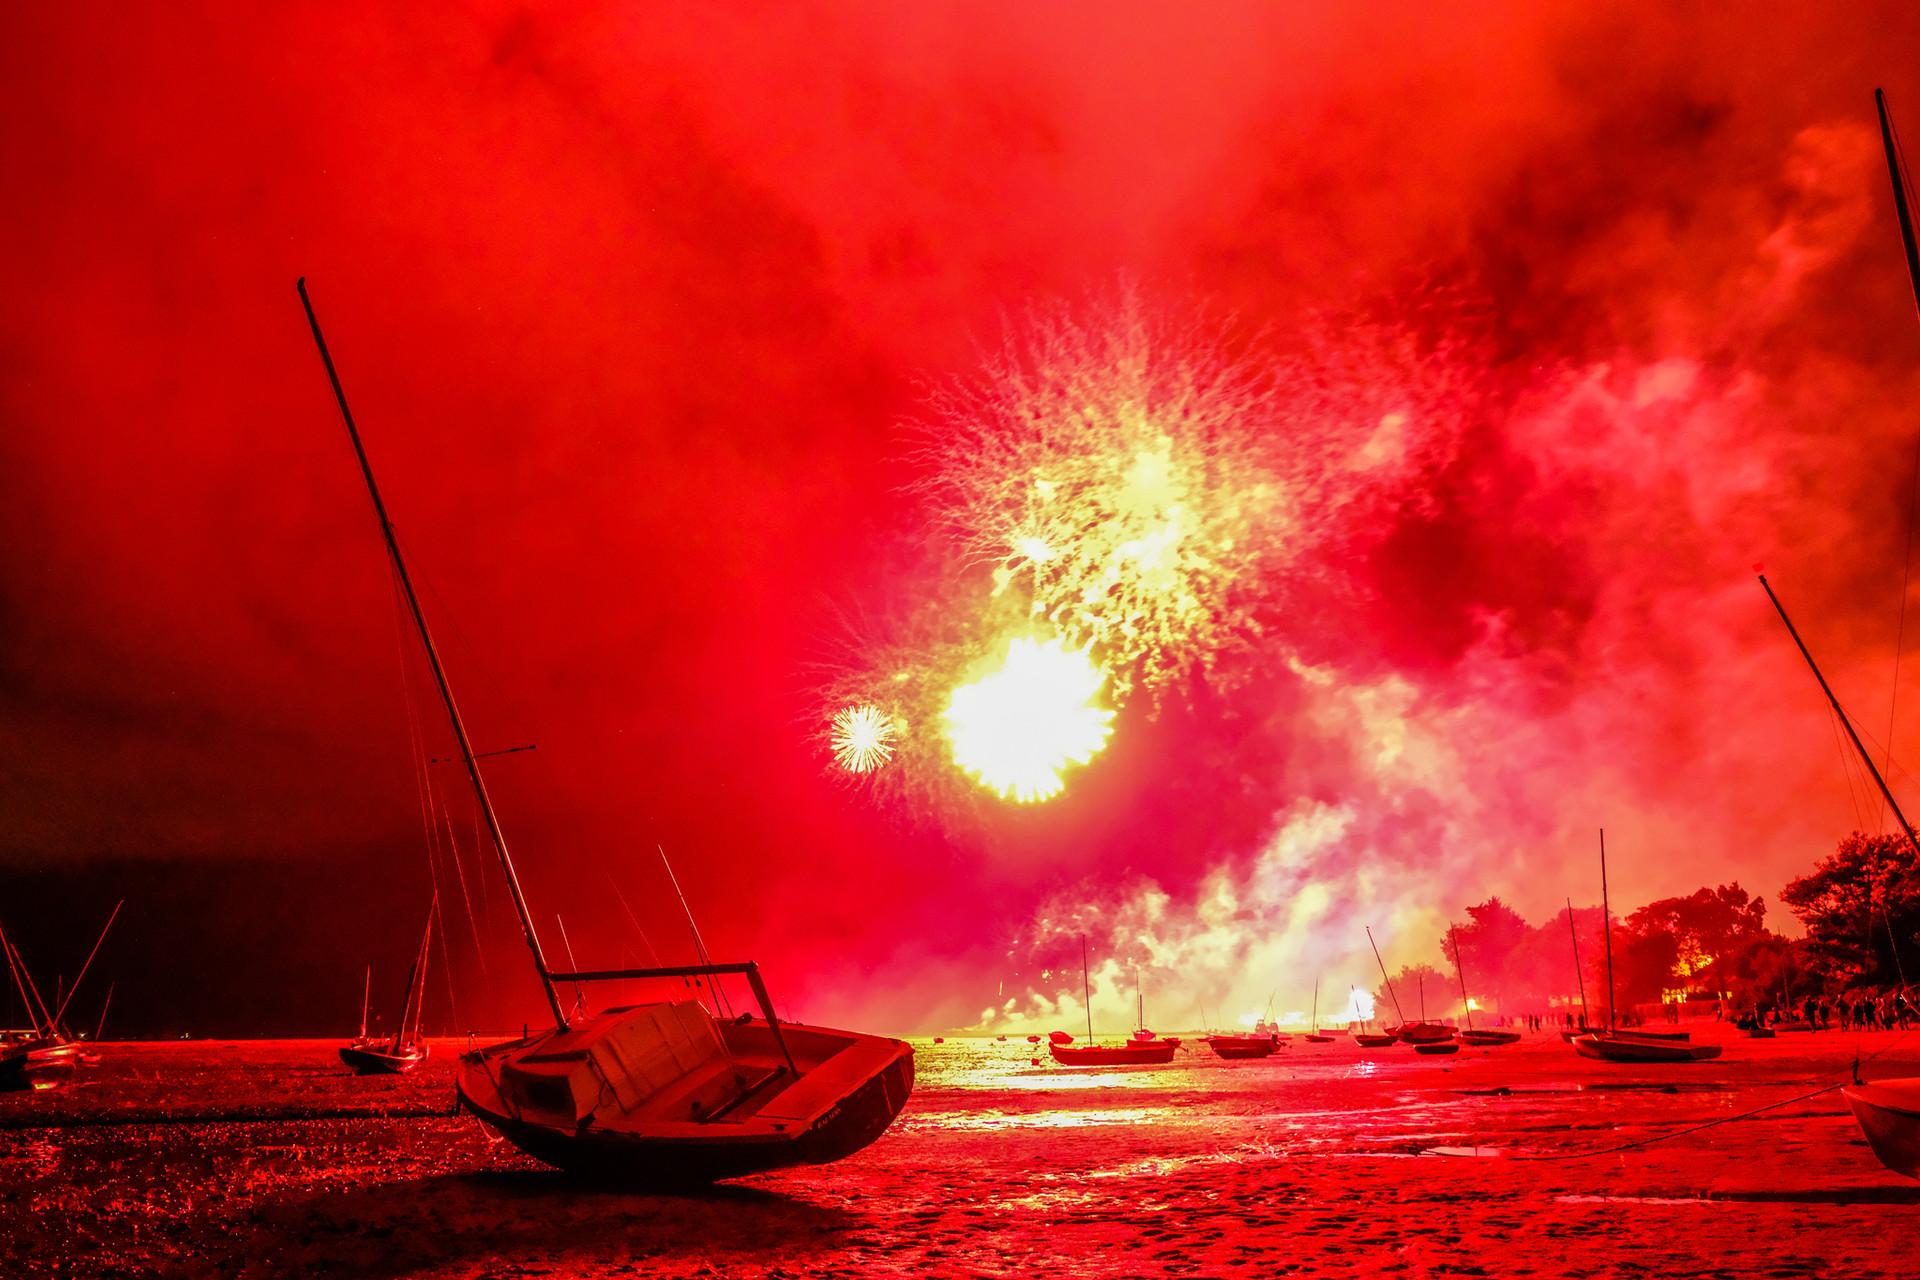 Fireworks over the Bassin d'Arcachon